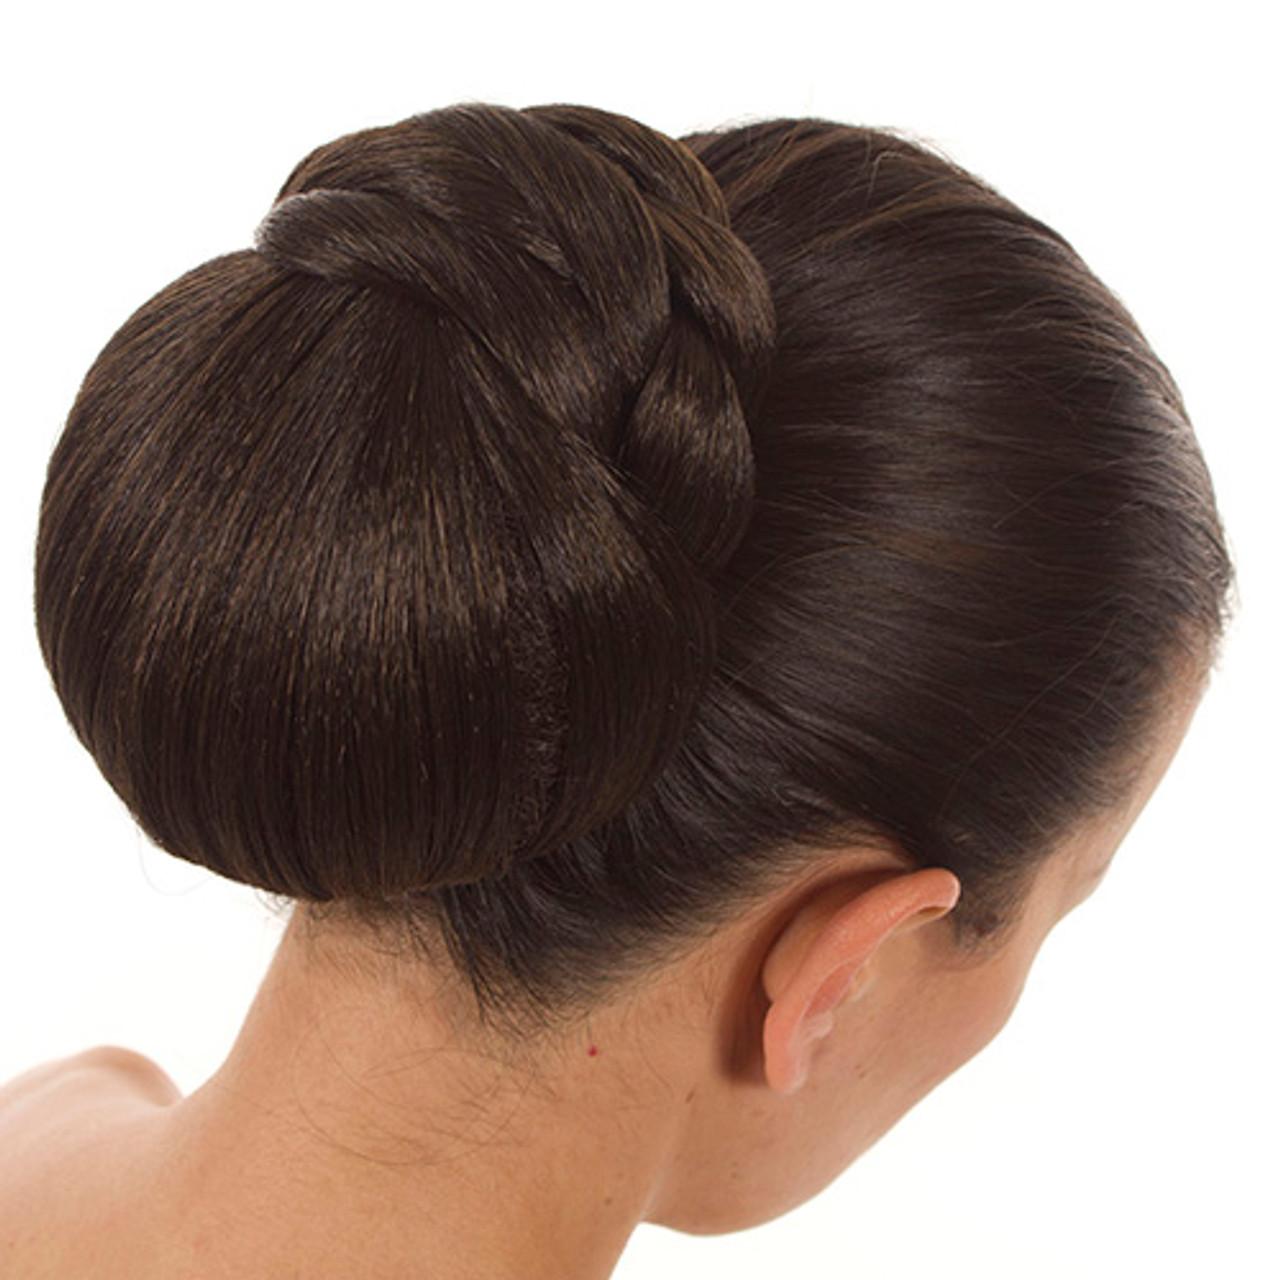 Clip-on Hairpiece Bun   Braided   10 Shades